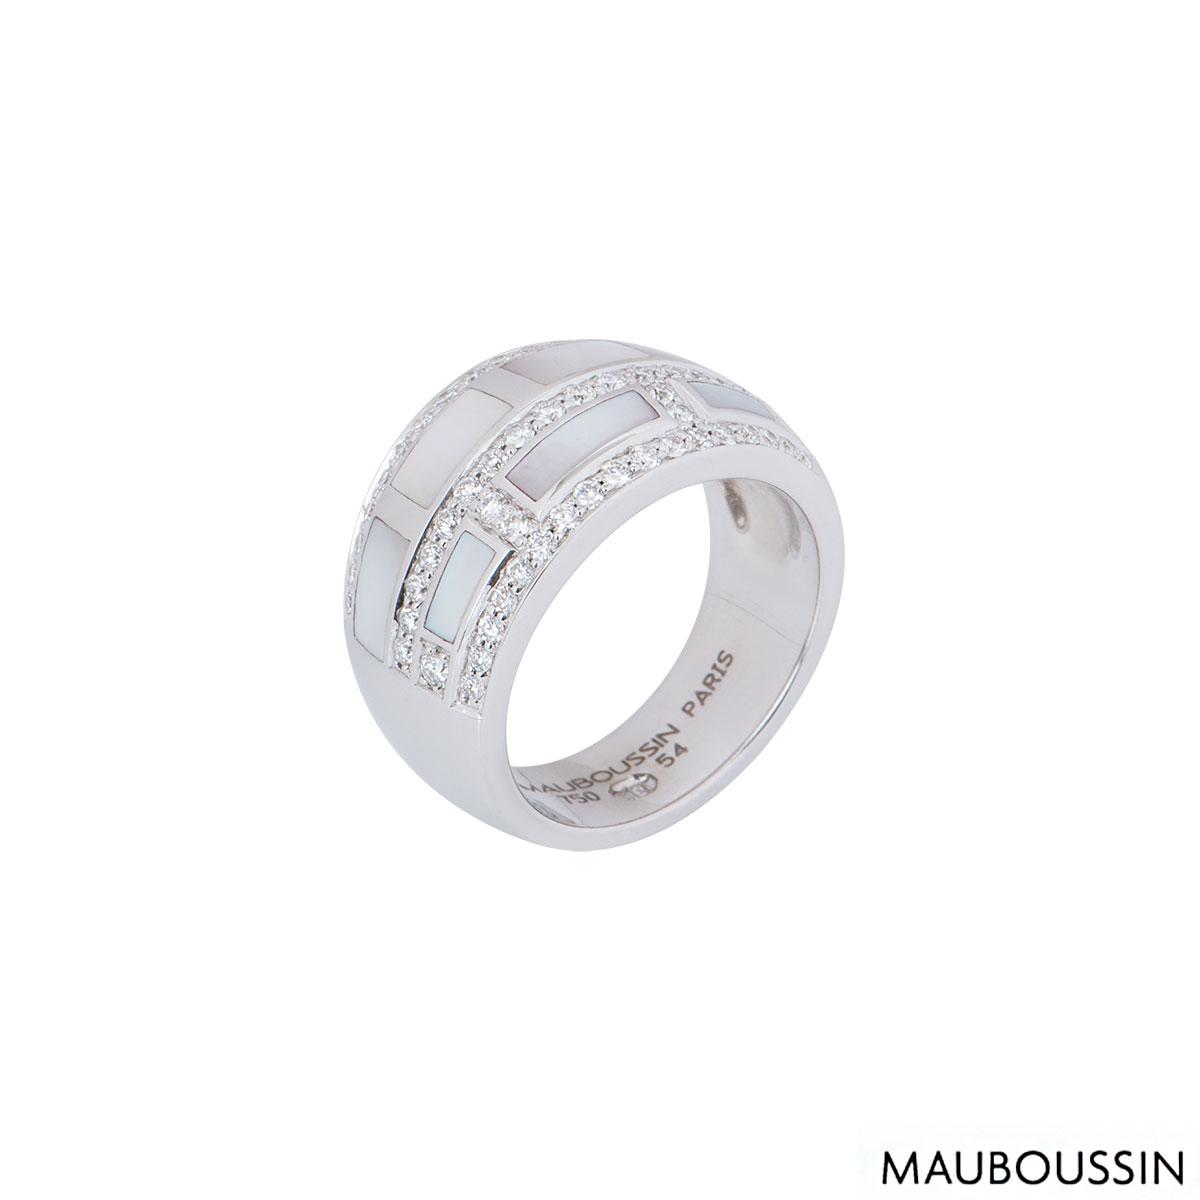 Mauboussin White Gold Le Vice Et La Verta Ring